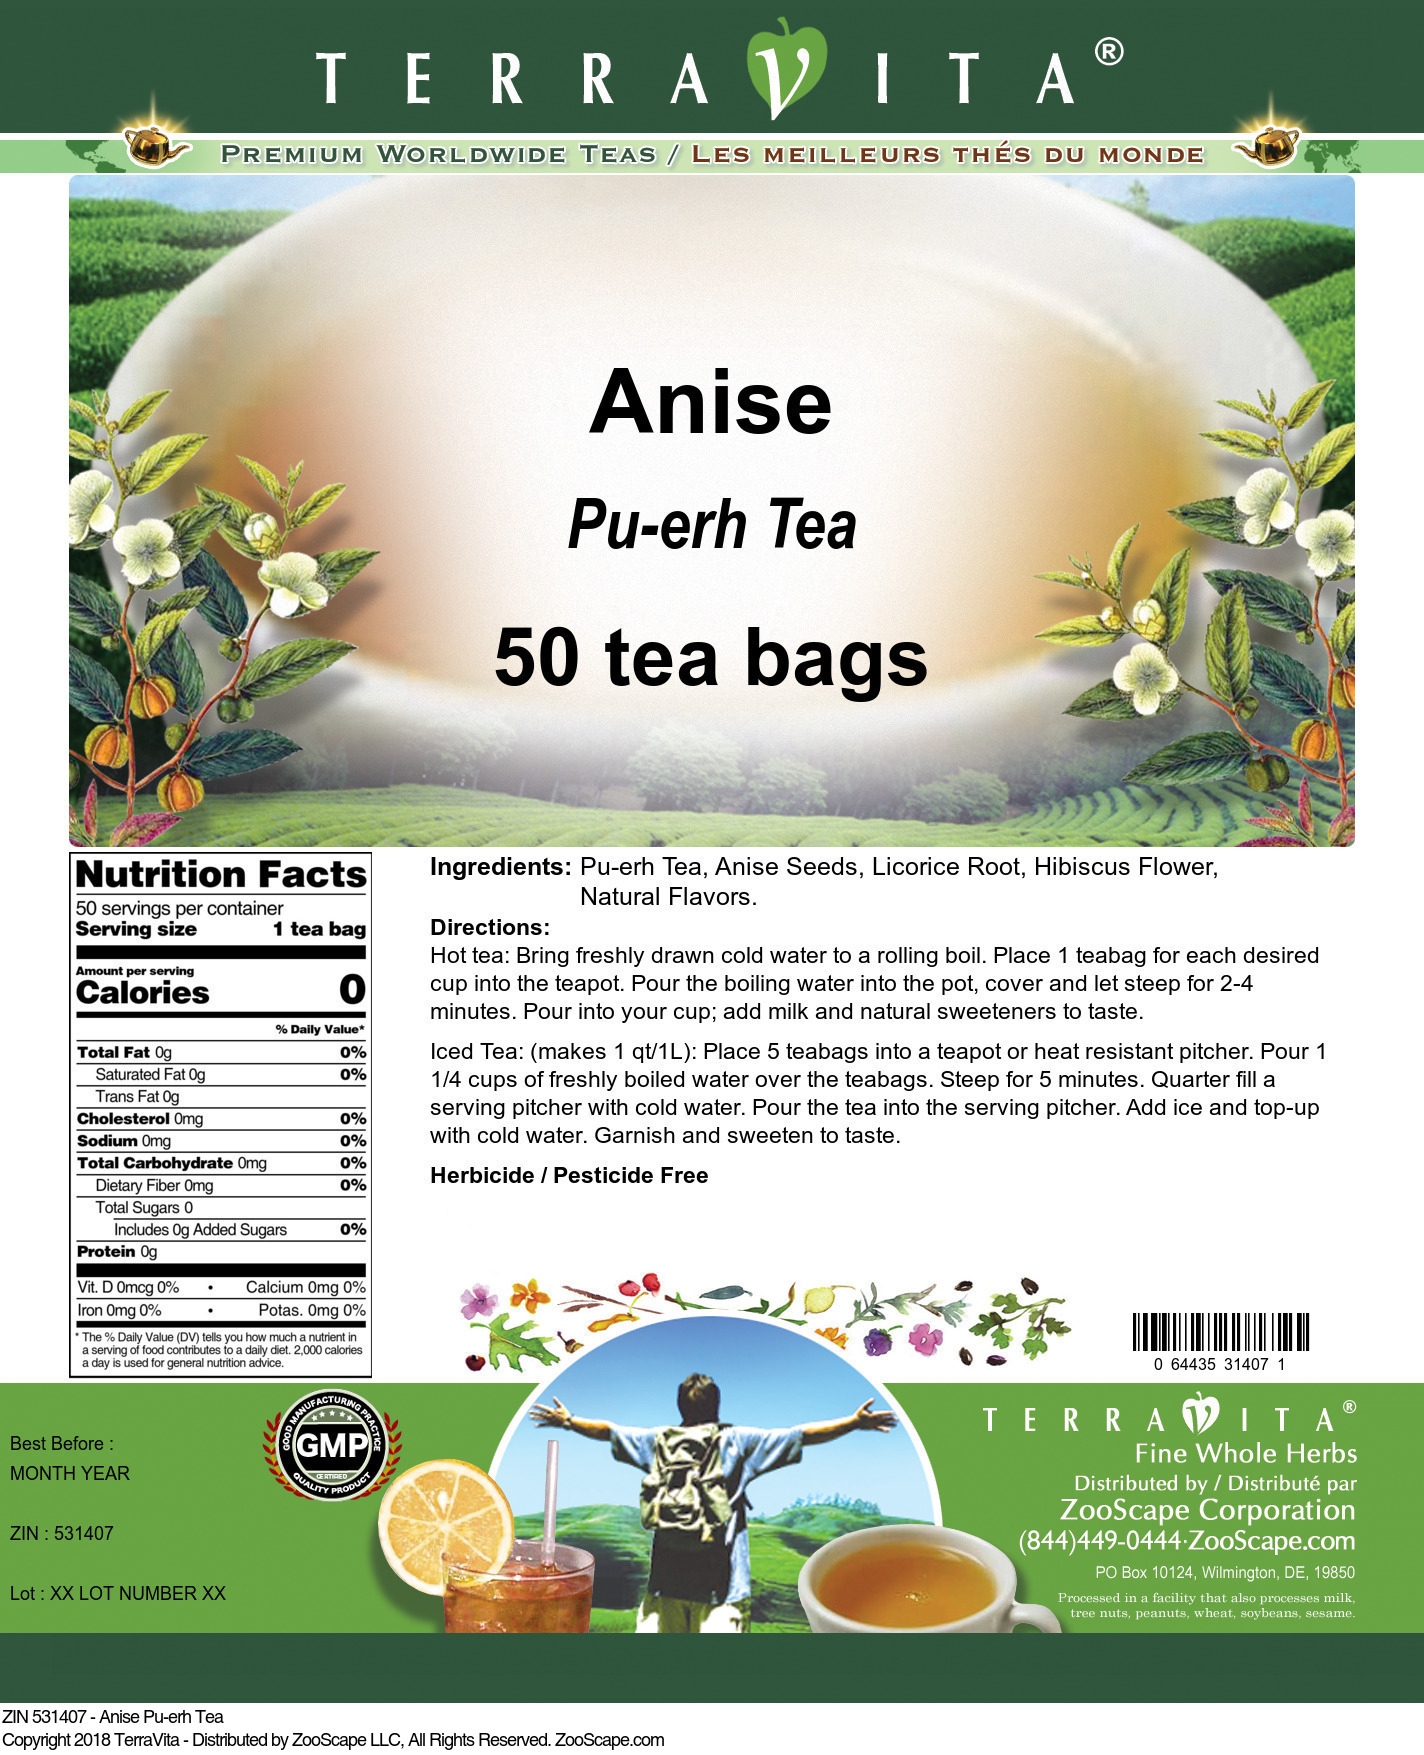 Anise Pu-erh Tea